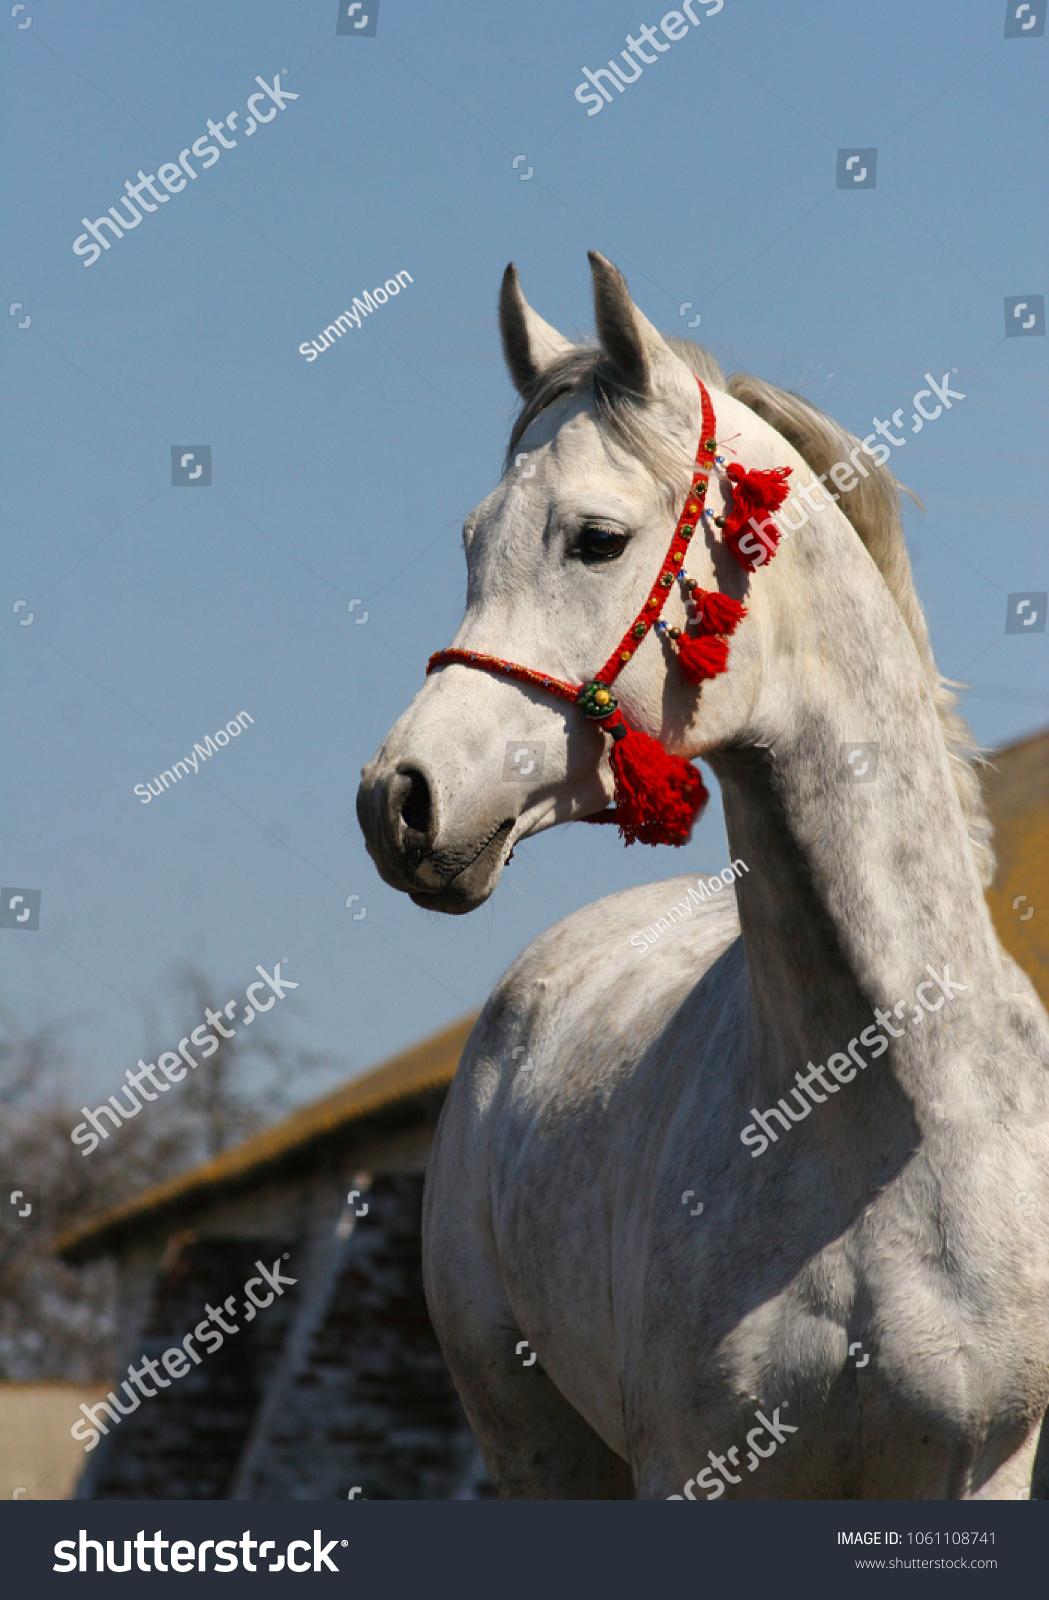 Purebred Arabian Horse Red Arabian Halter Stock Photo Edit Now 1061108741